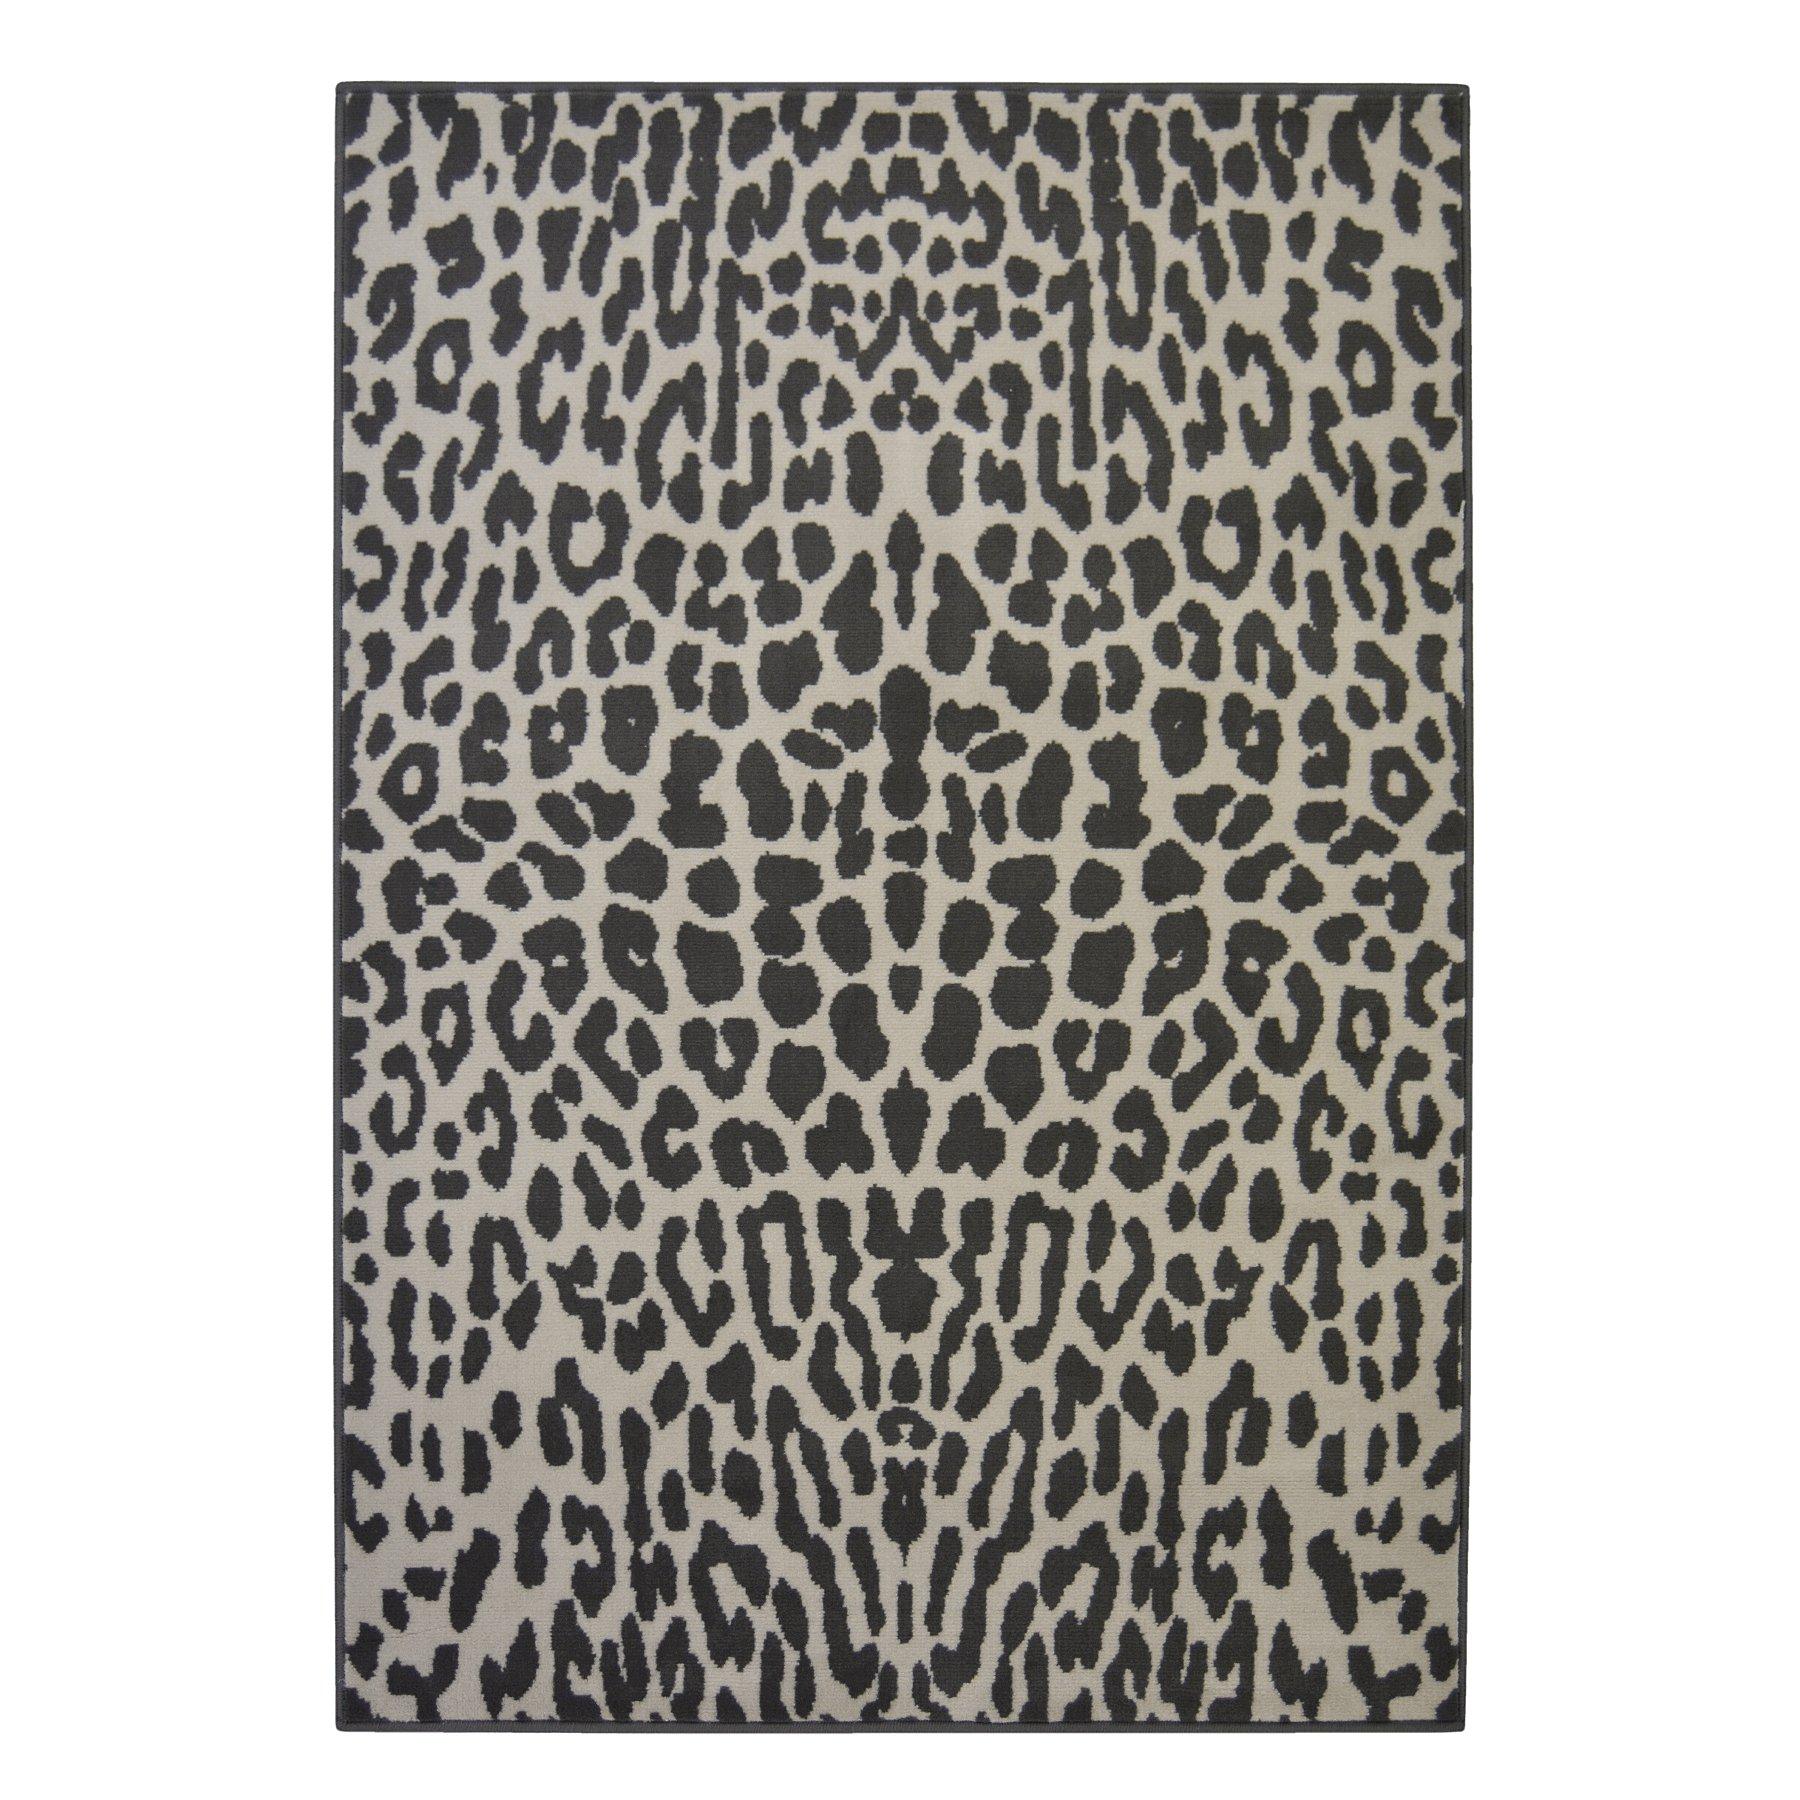 Leopard Print Rug Home George